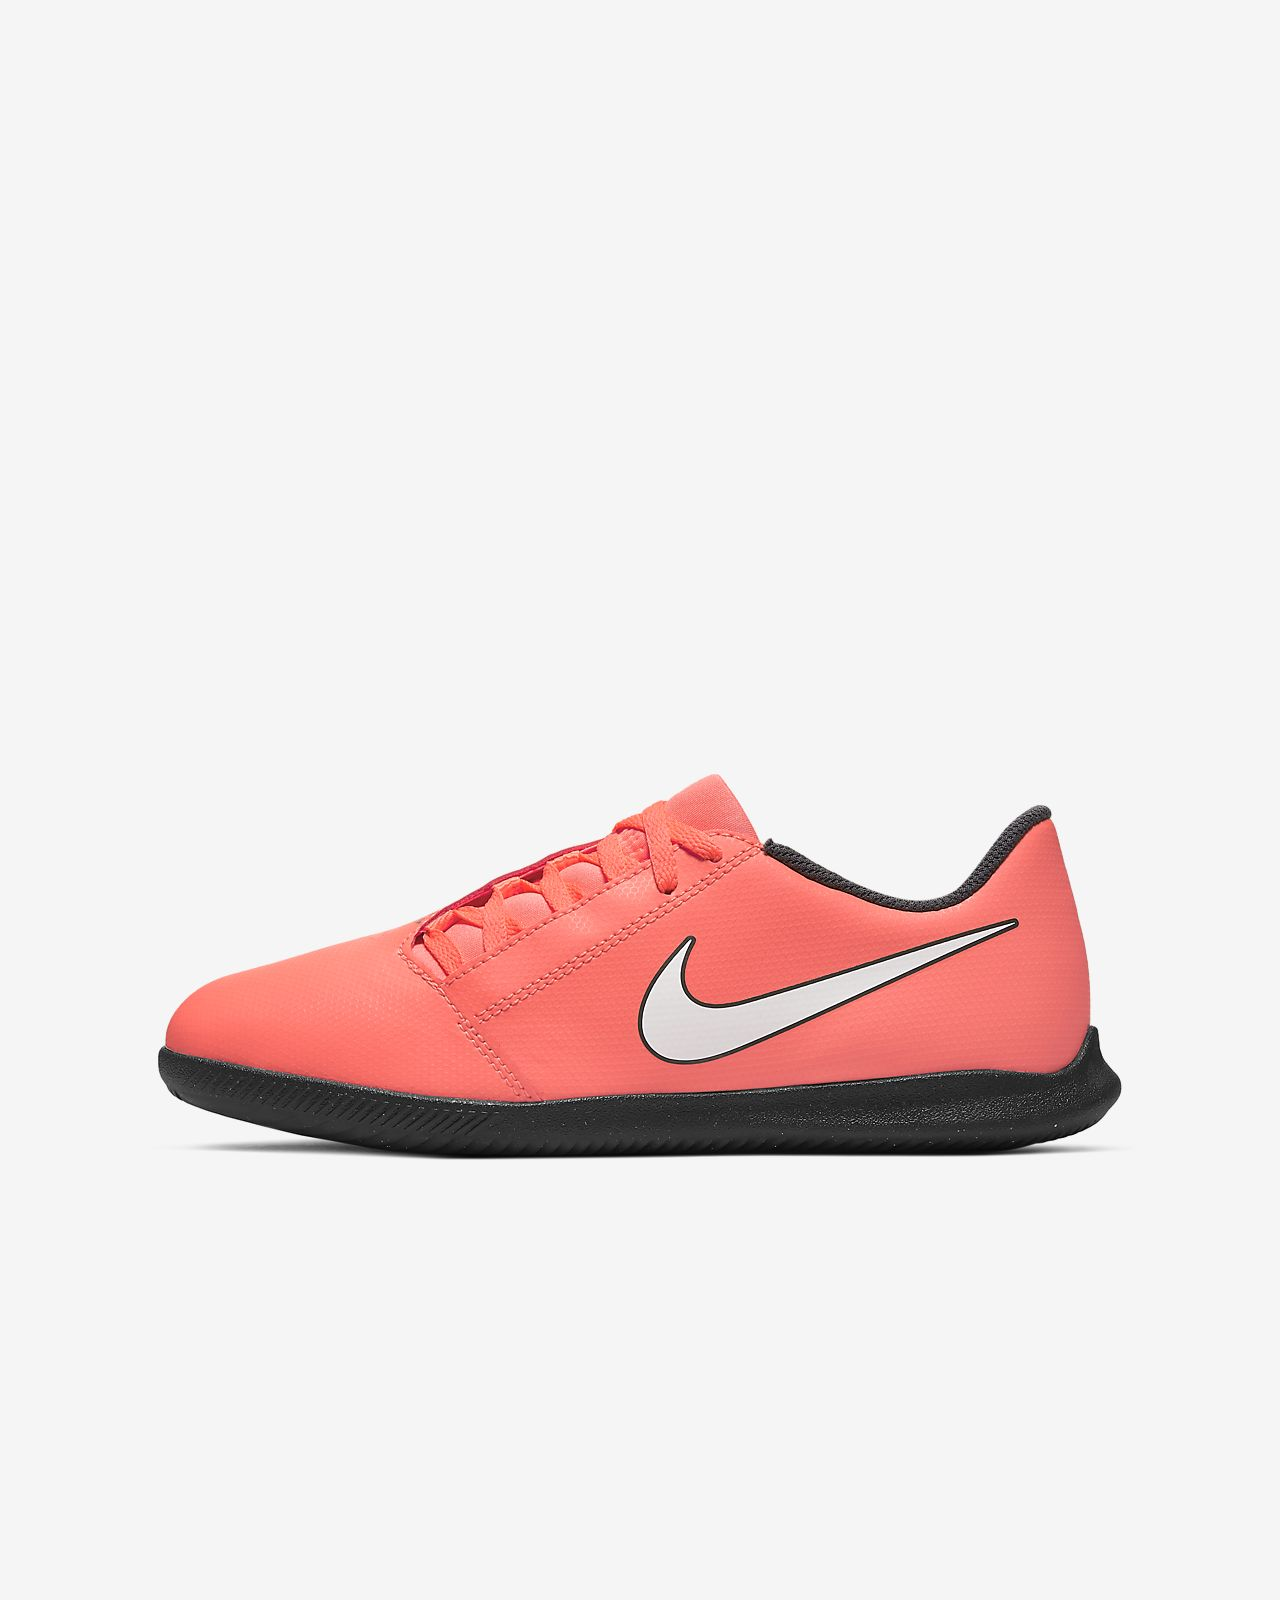 Scarpa da calcio per campo indoor/cemento Nike Jr. Phantom Venom Club IC - Bambini/Ragazzi